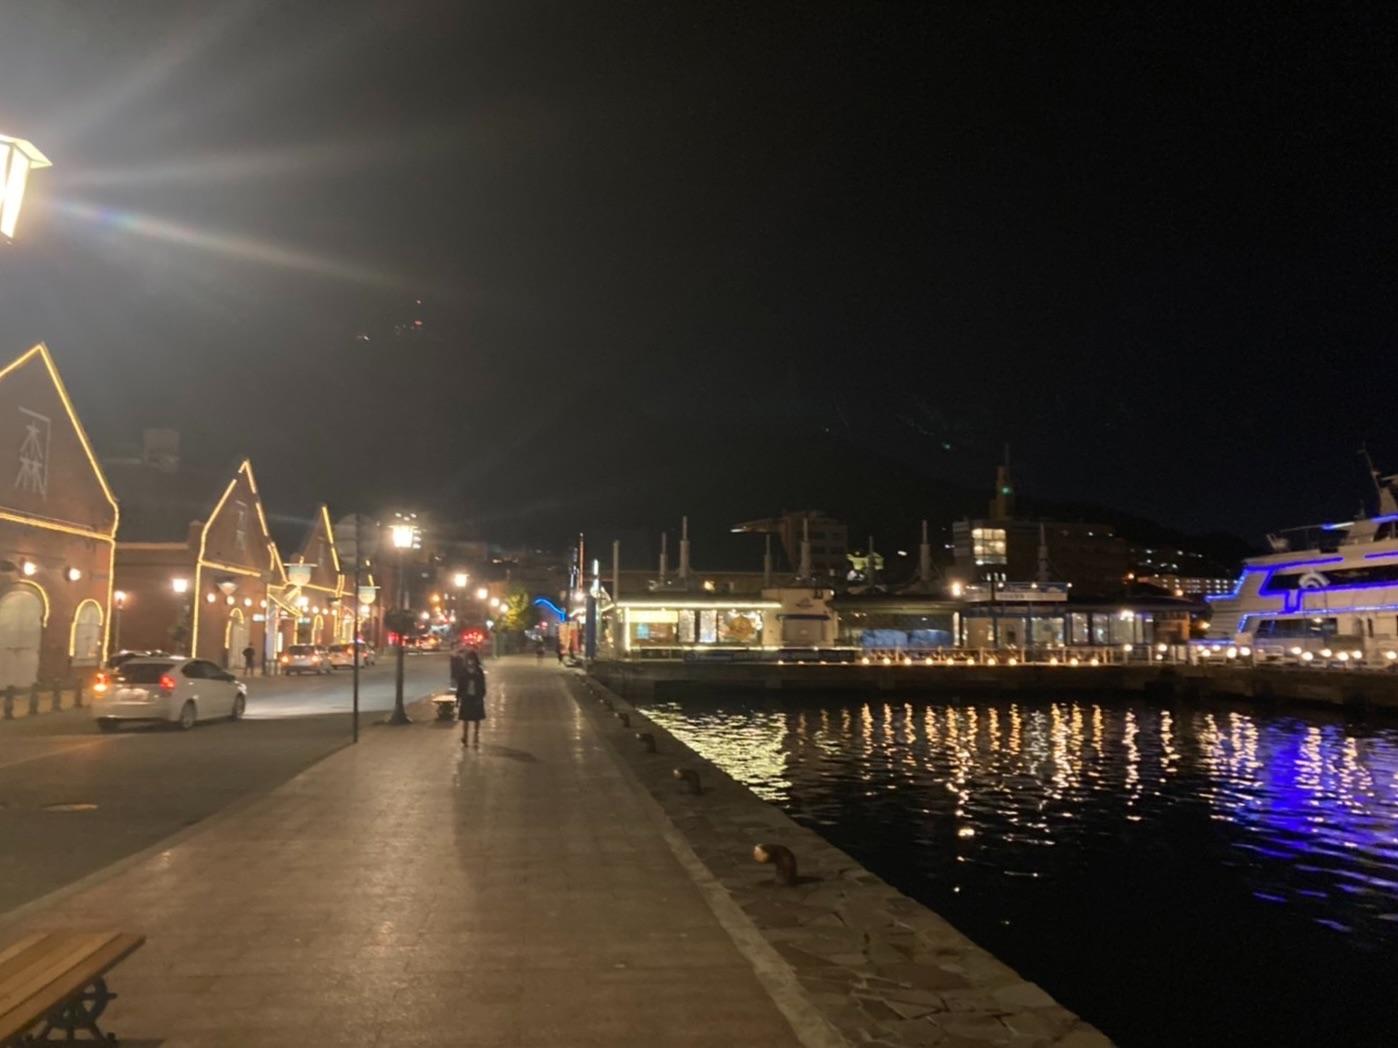 f:id:tamasapuri:20210916180149j:image